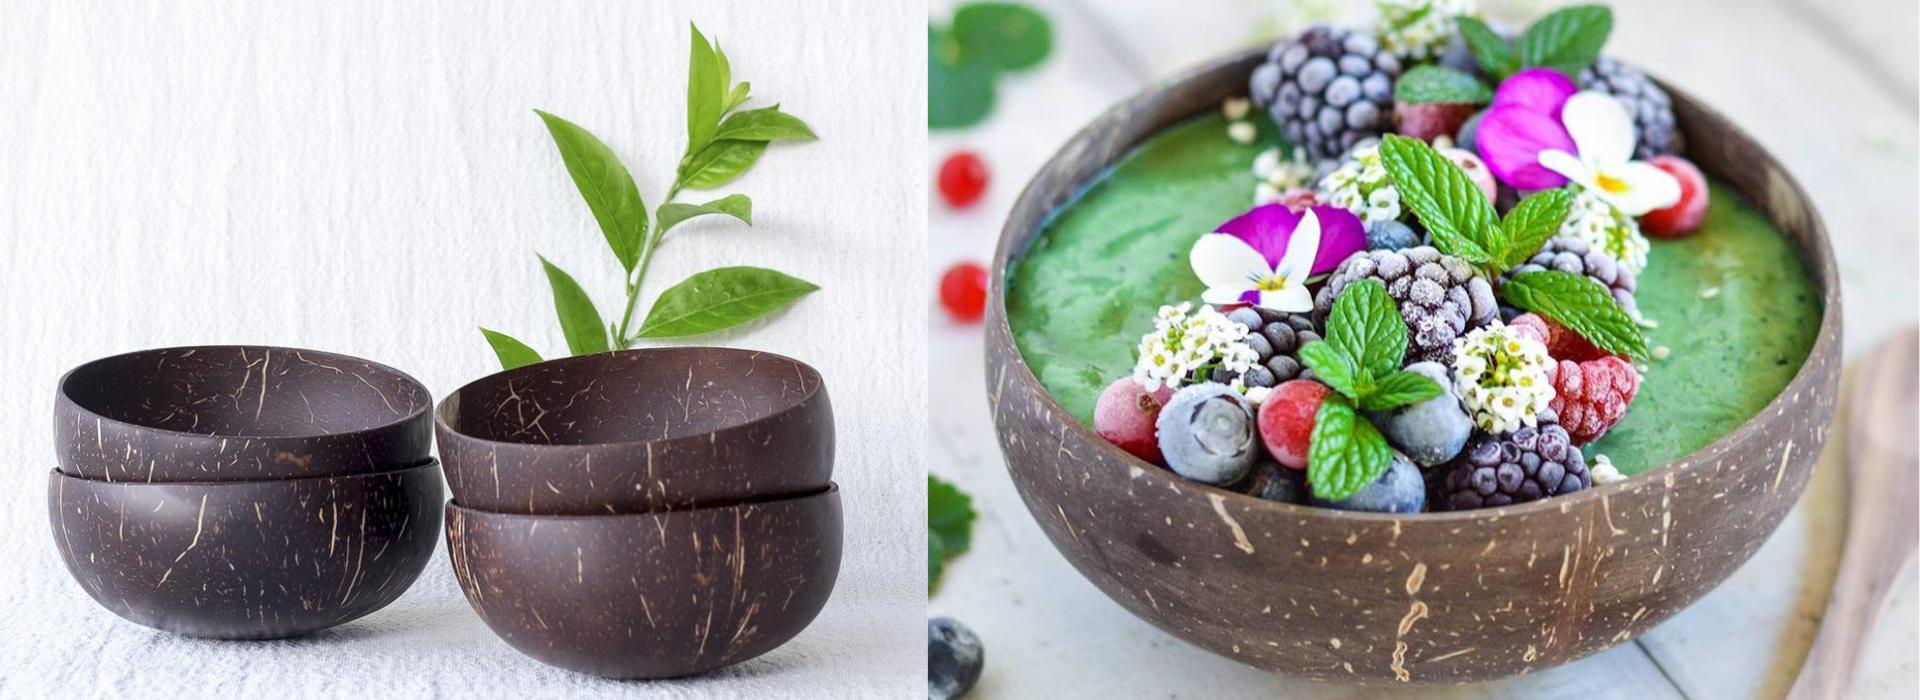 Gáo dừa coconut bowl